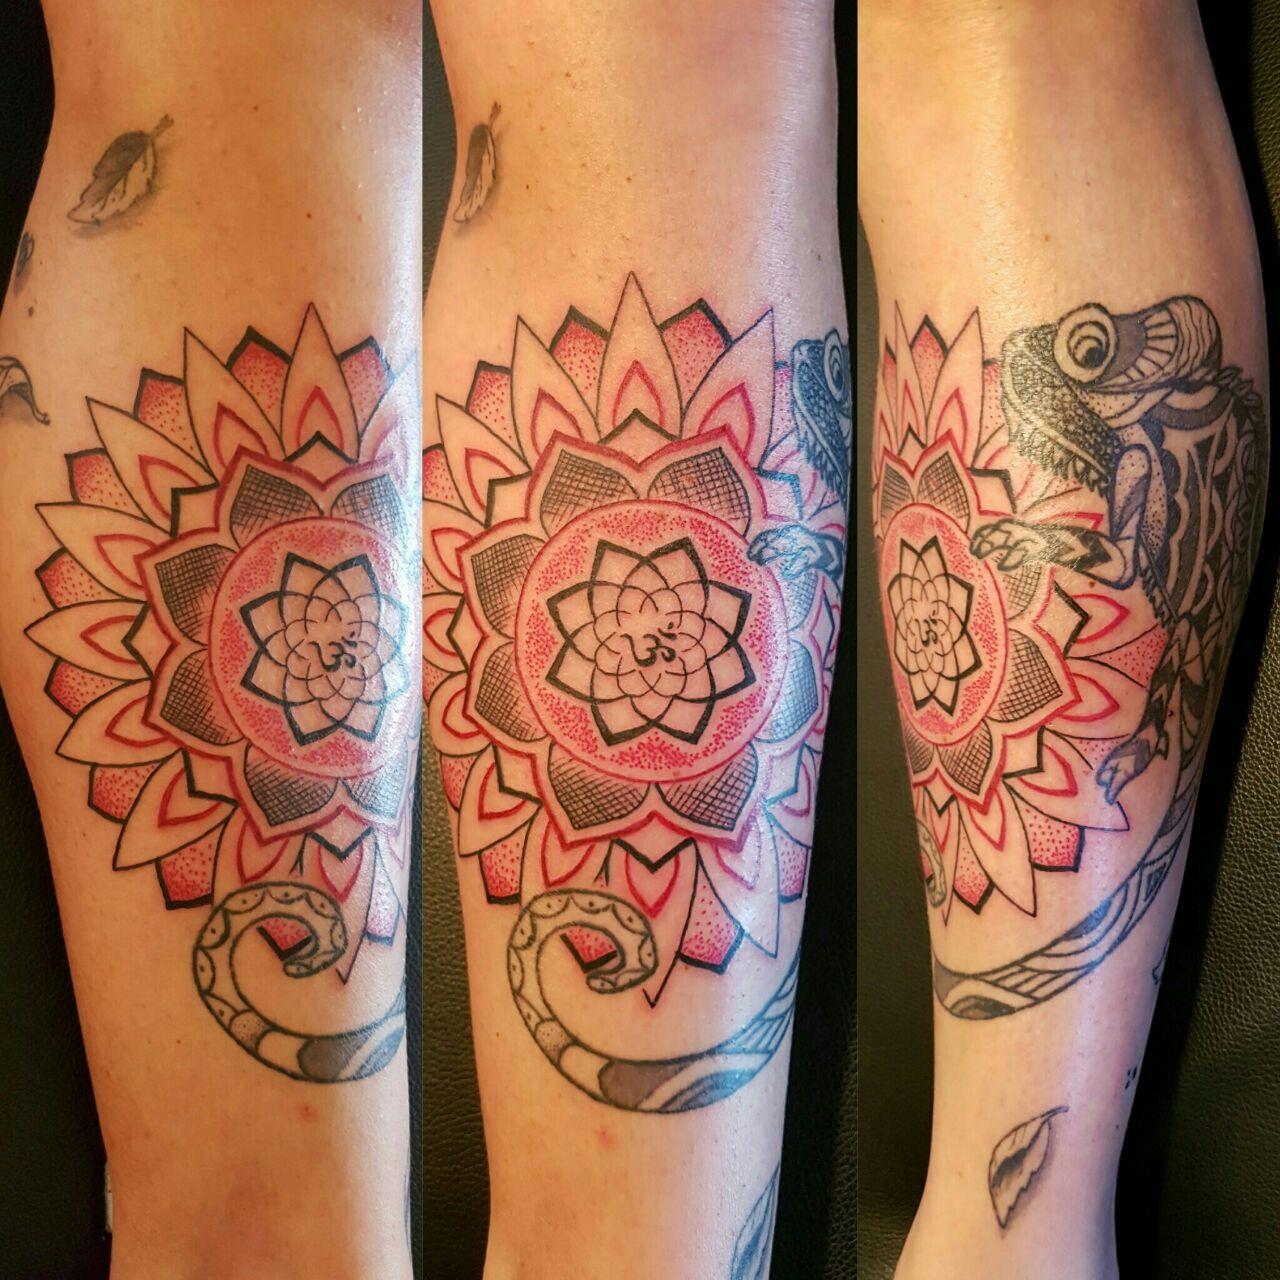 tattoo artist antares piercing tattoo tattooentfernung. Black Bedroom Furniture Sets. Home Design Ideas